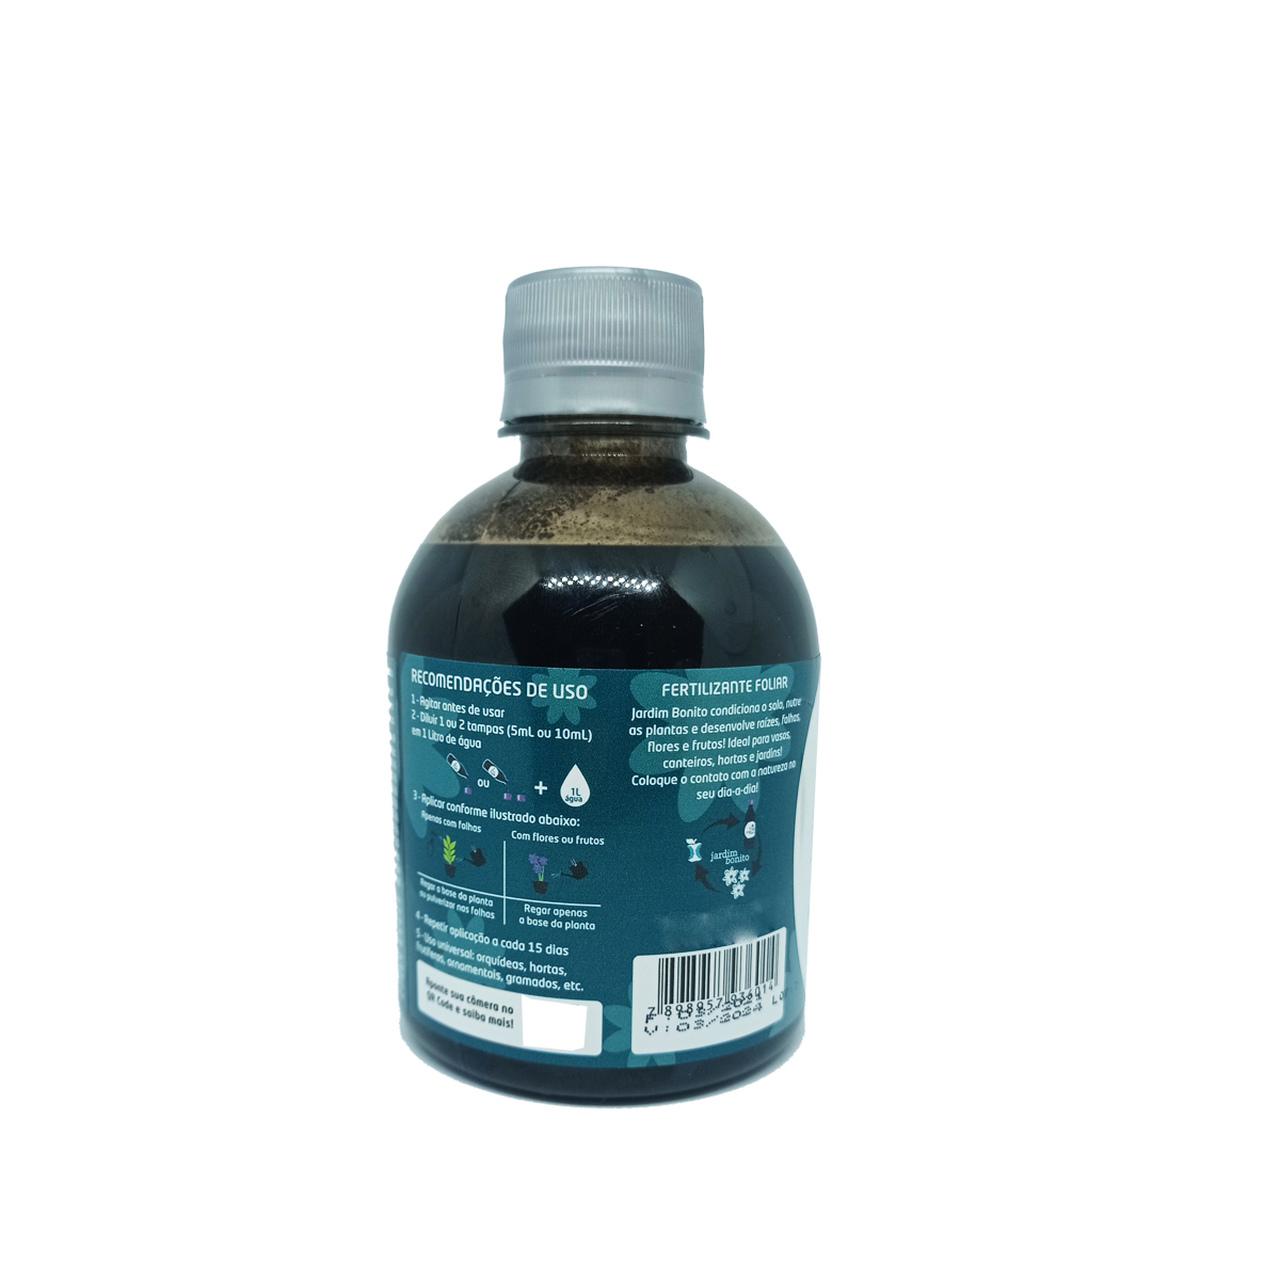 JARDIM BONITO EMBALAGEM PLASTICA 250 ML